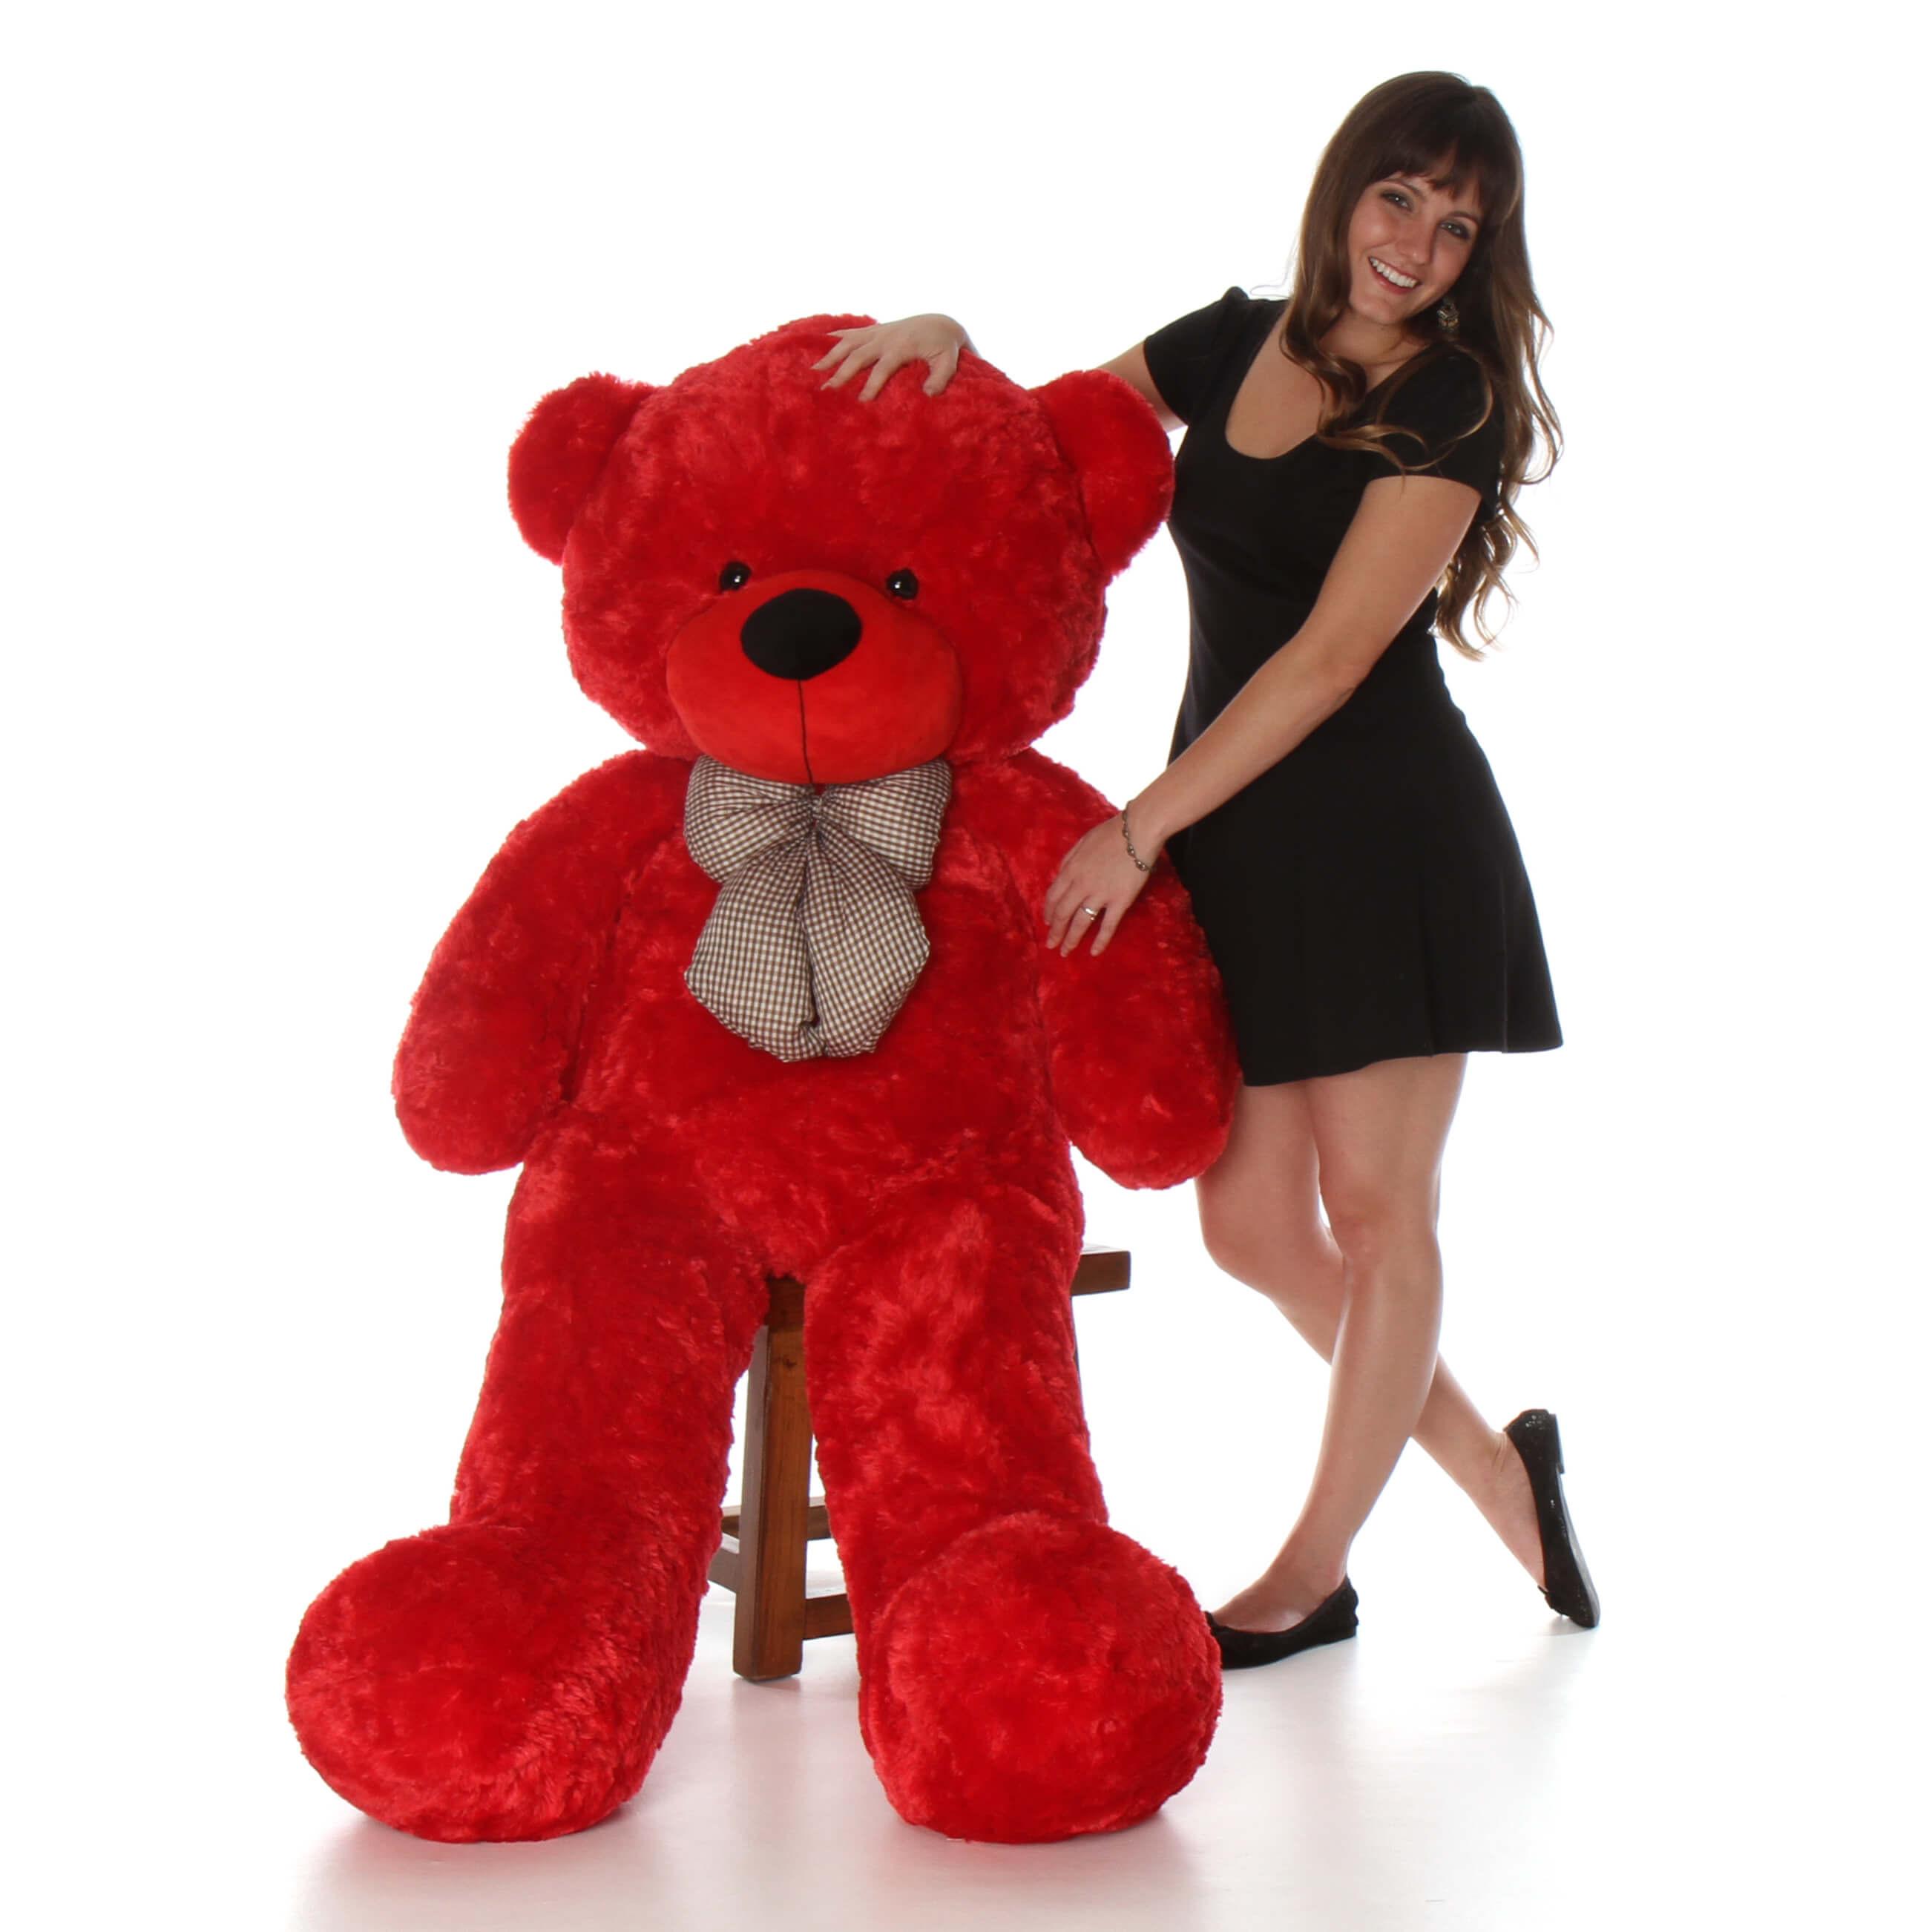 huge-life-size-60in-red-teddy-bear-bitsy-cuddles-soft-1.jpg